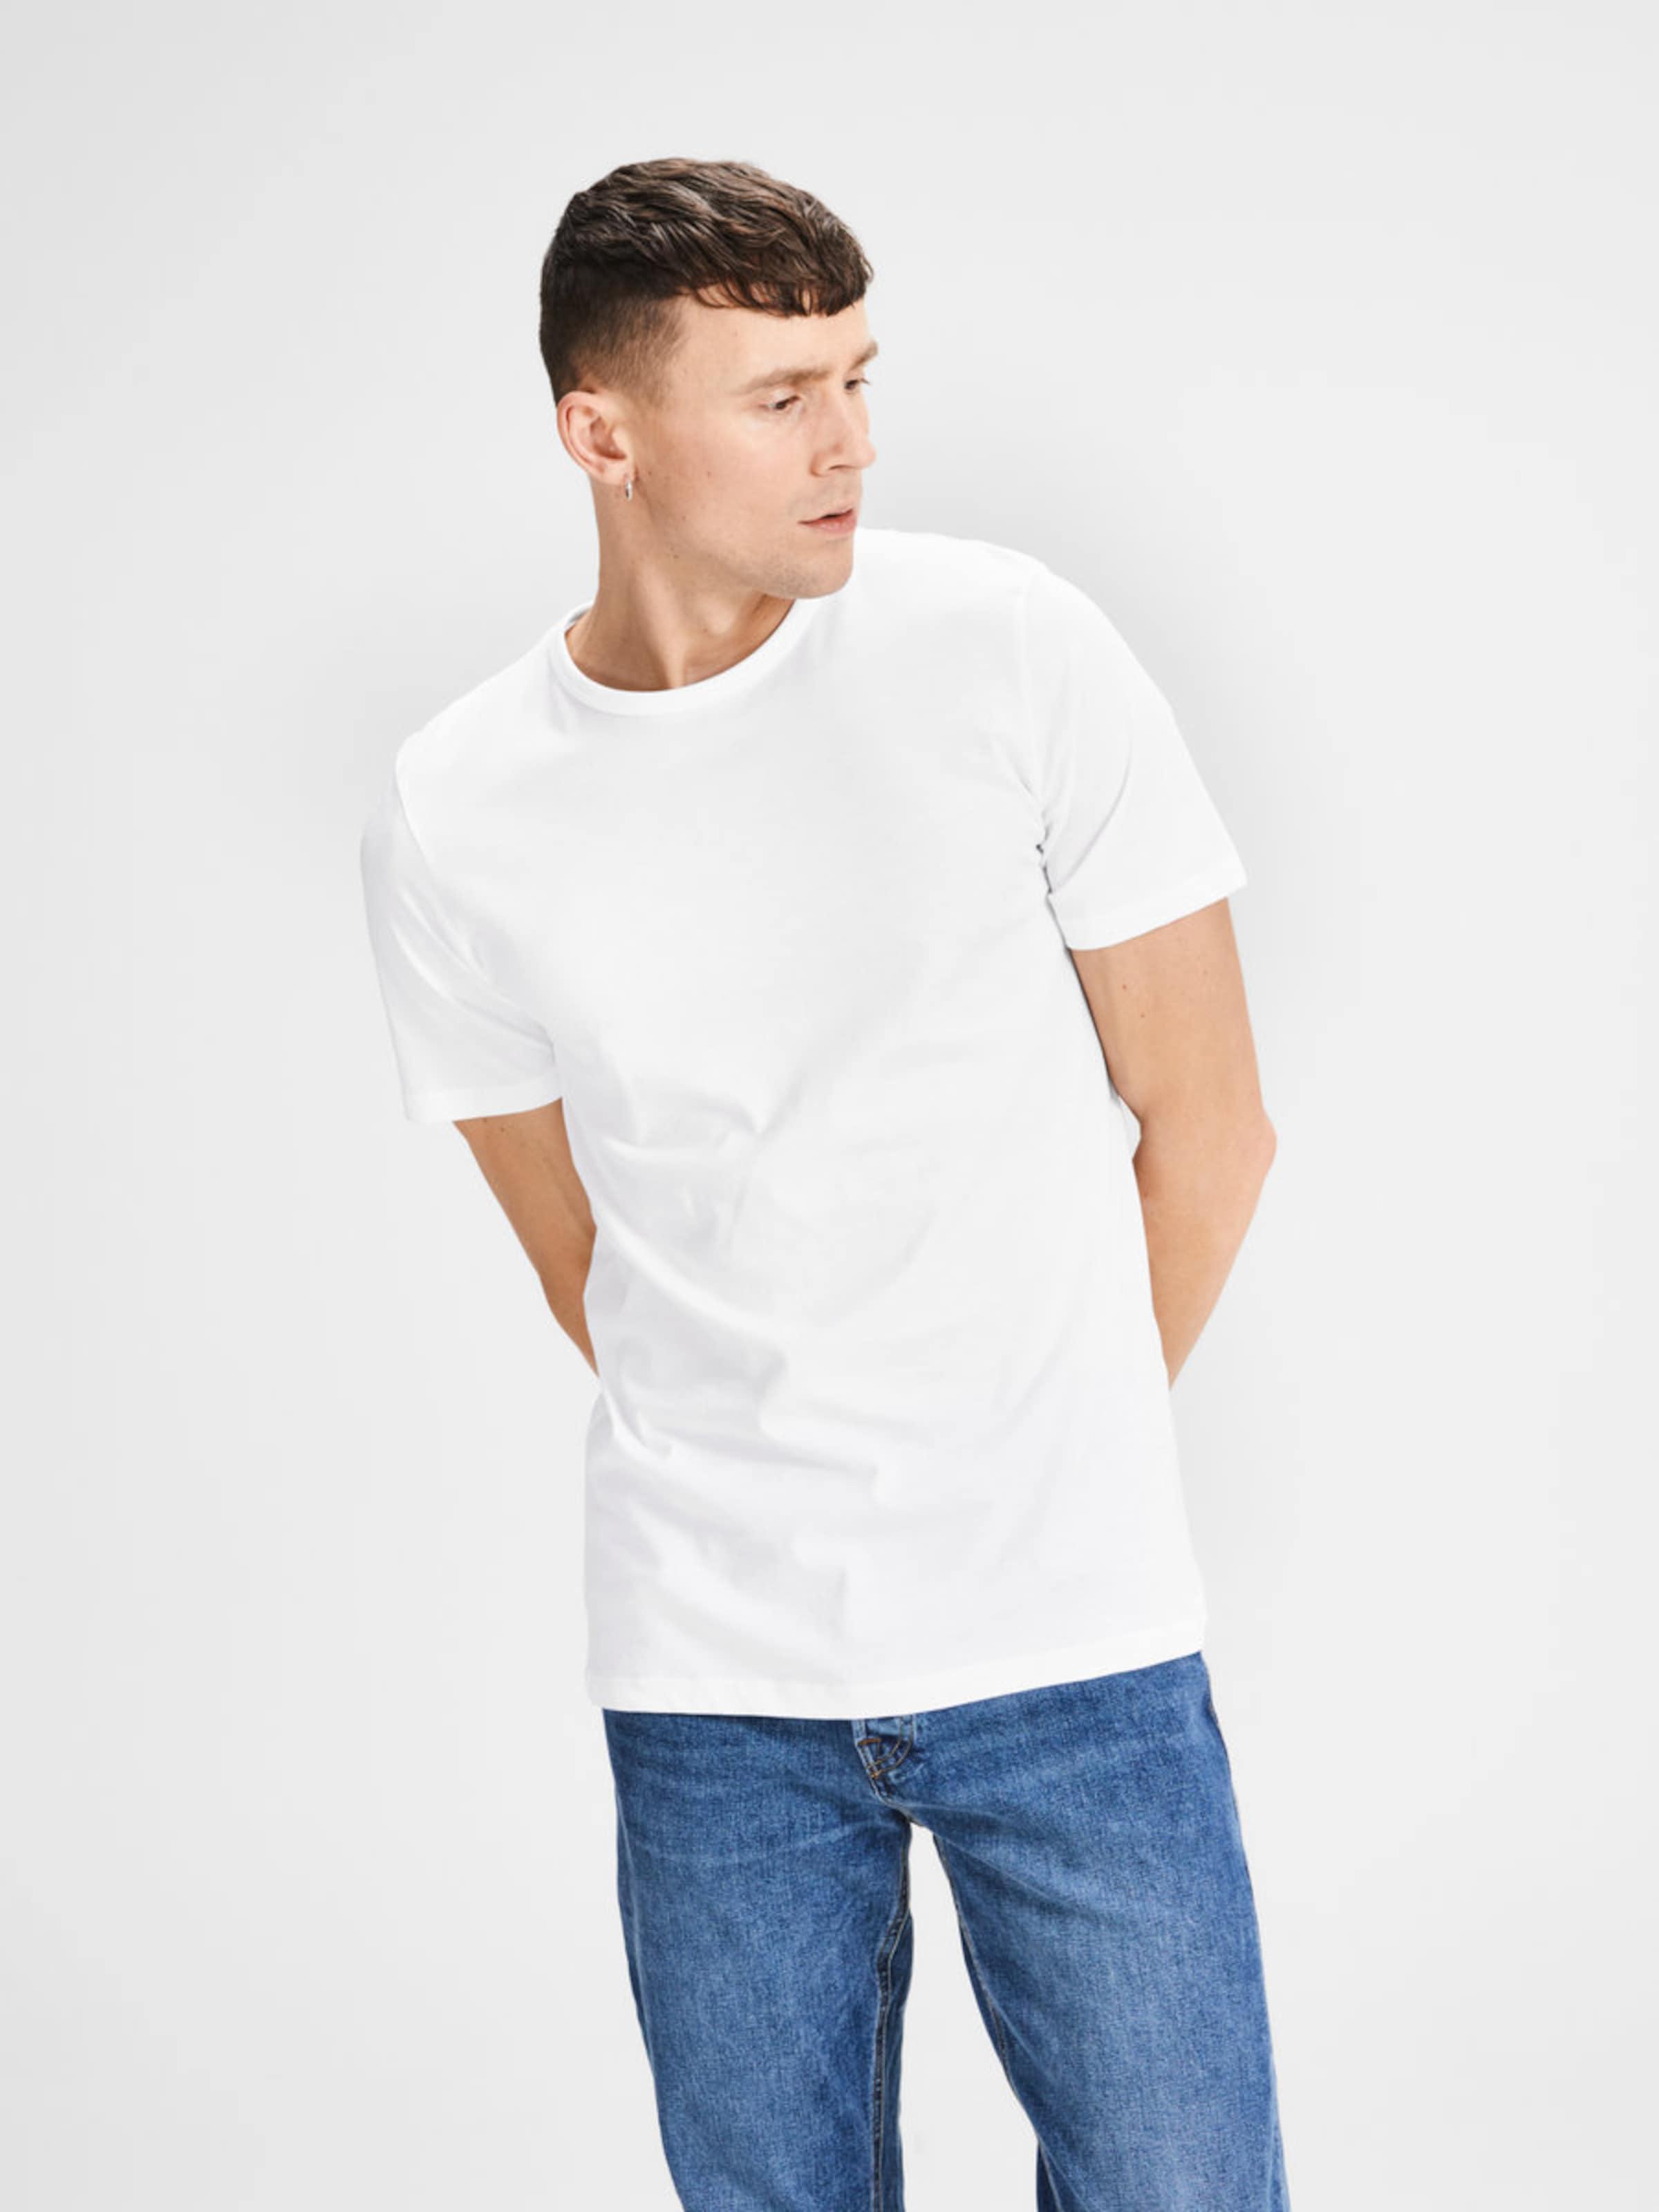 JACK & JONES T-Shirt Neueste Online-Verkauf lBr2C